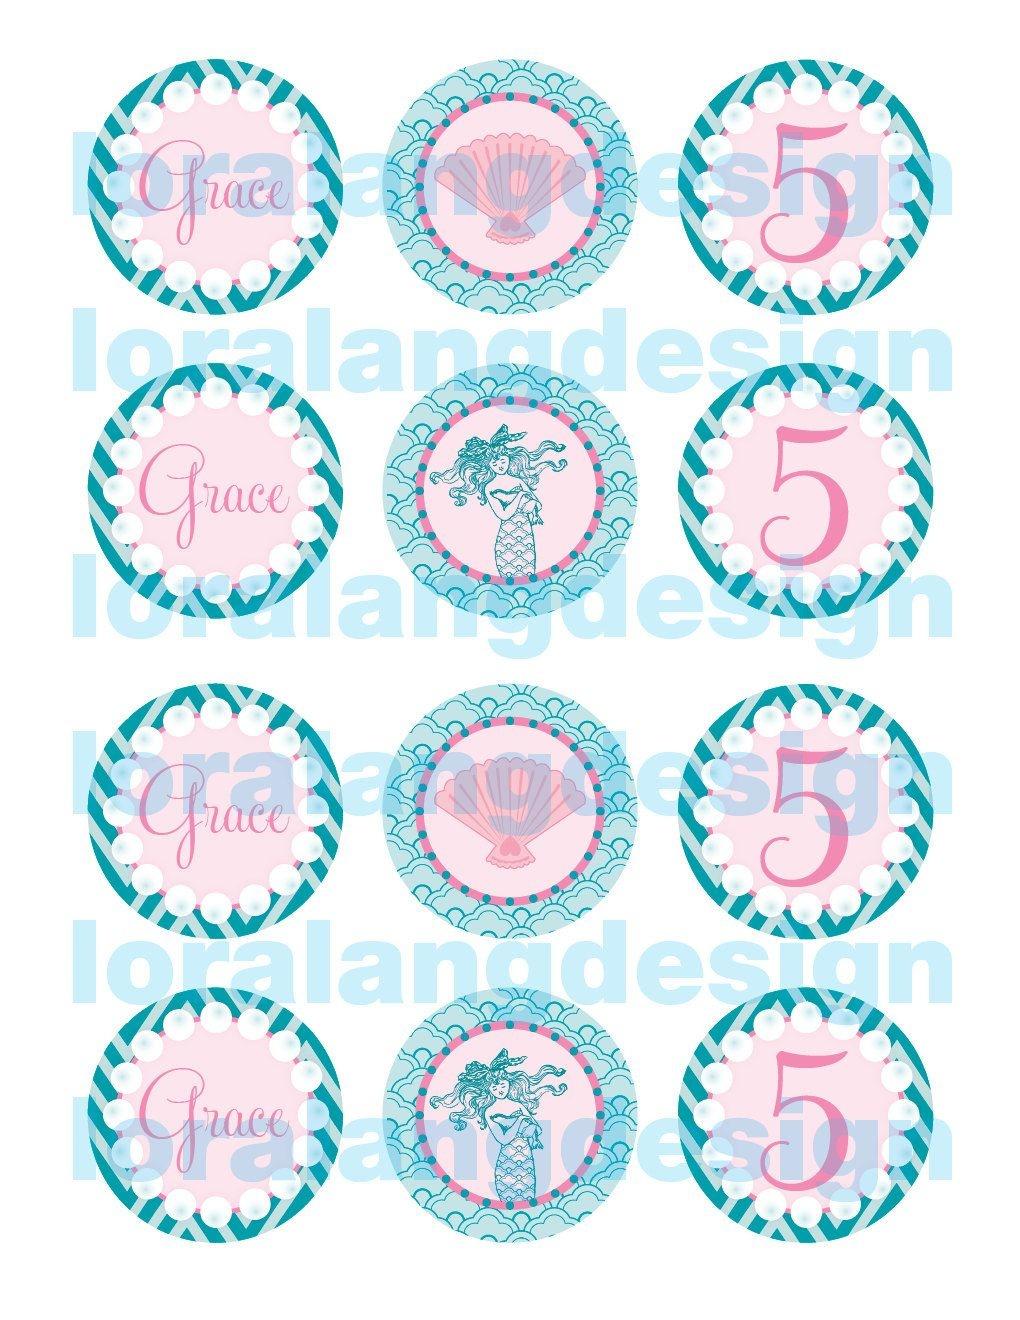 Printable Mermaid Cupcake Toppers Favors | Eg's 4Th Birthday - Free Printable Mermaid Cupcake Toppers